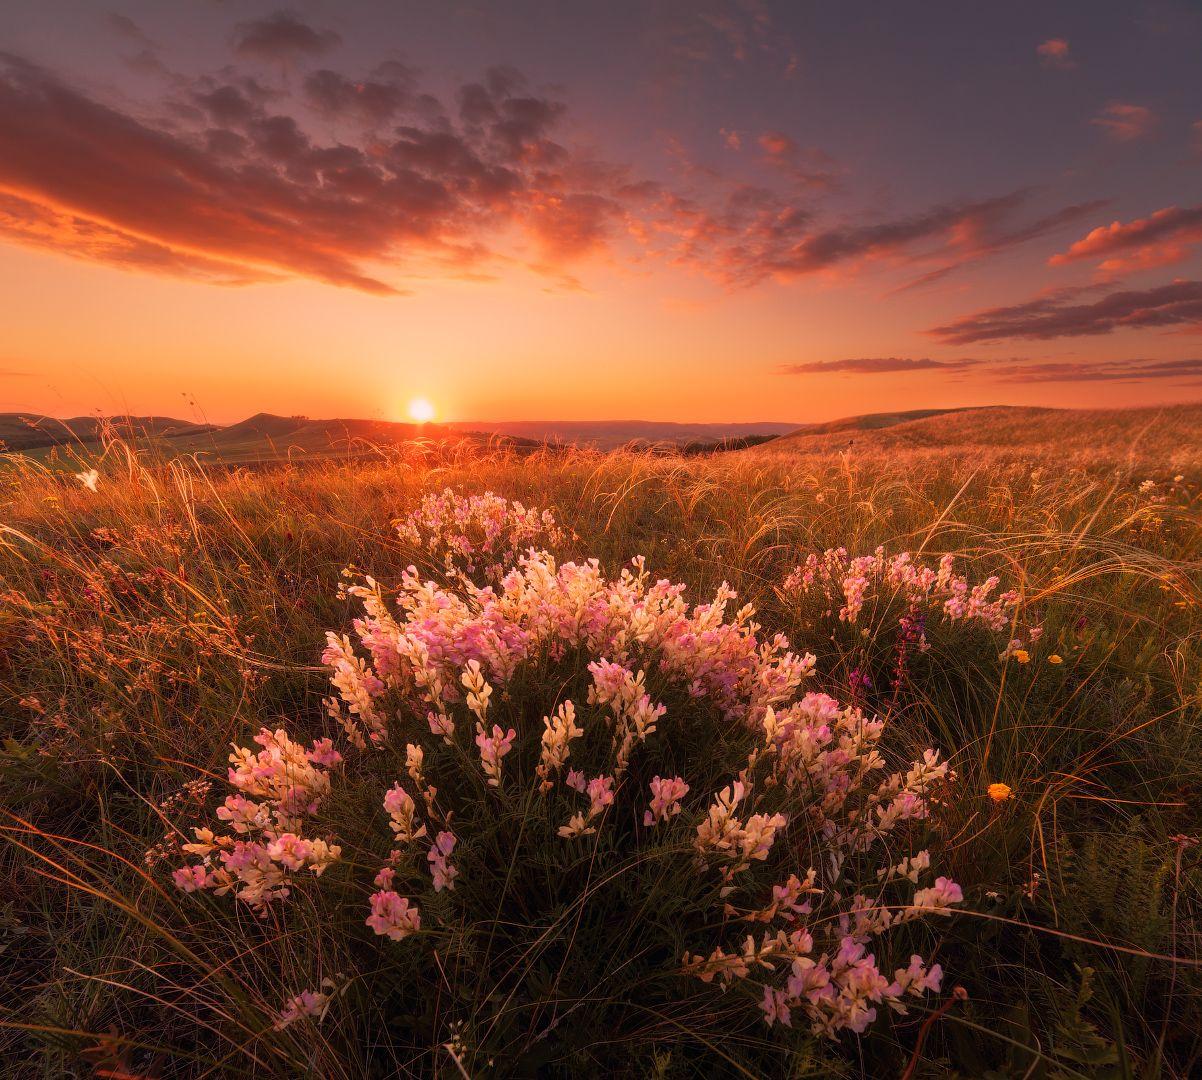 самом деле, фото цветов на восходе аппарат выполнен